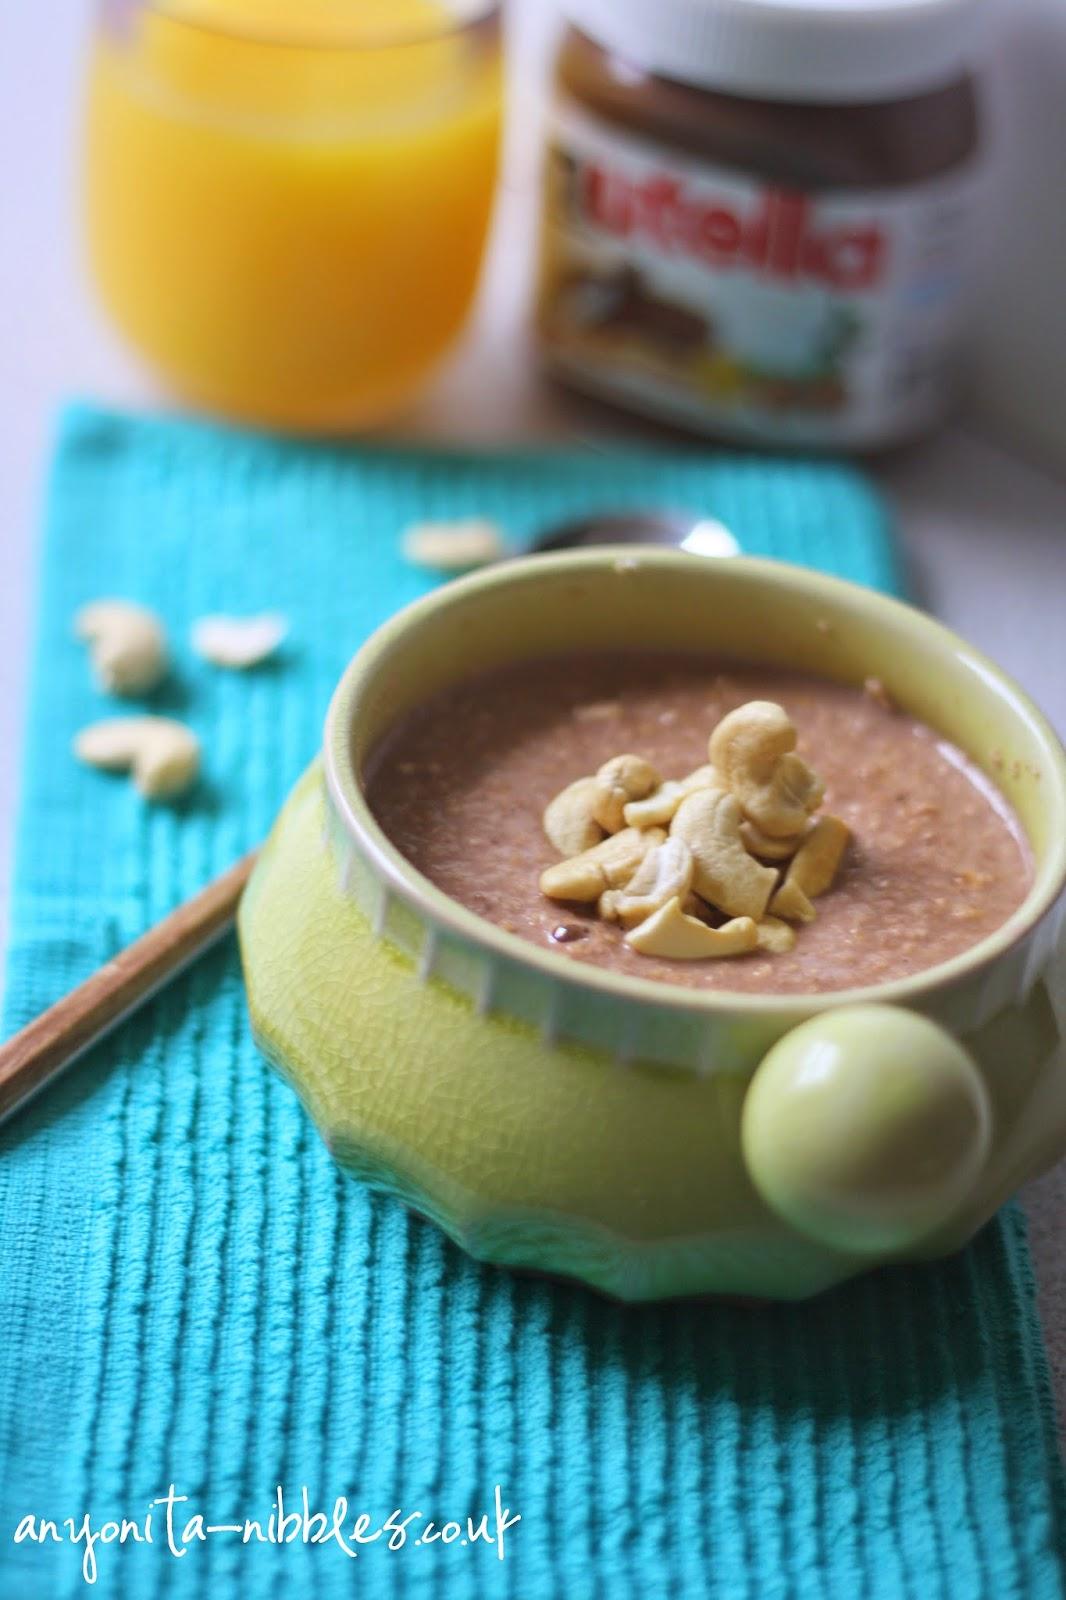 Raw cashews on porridge with Nutella